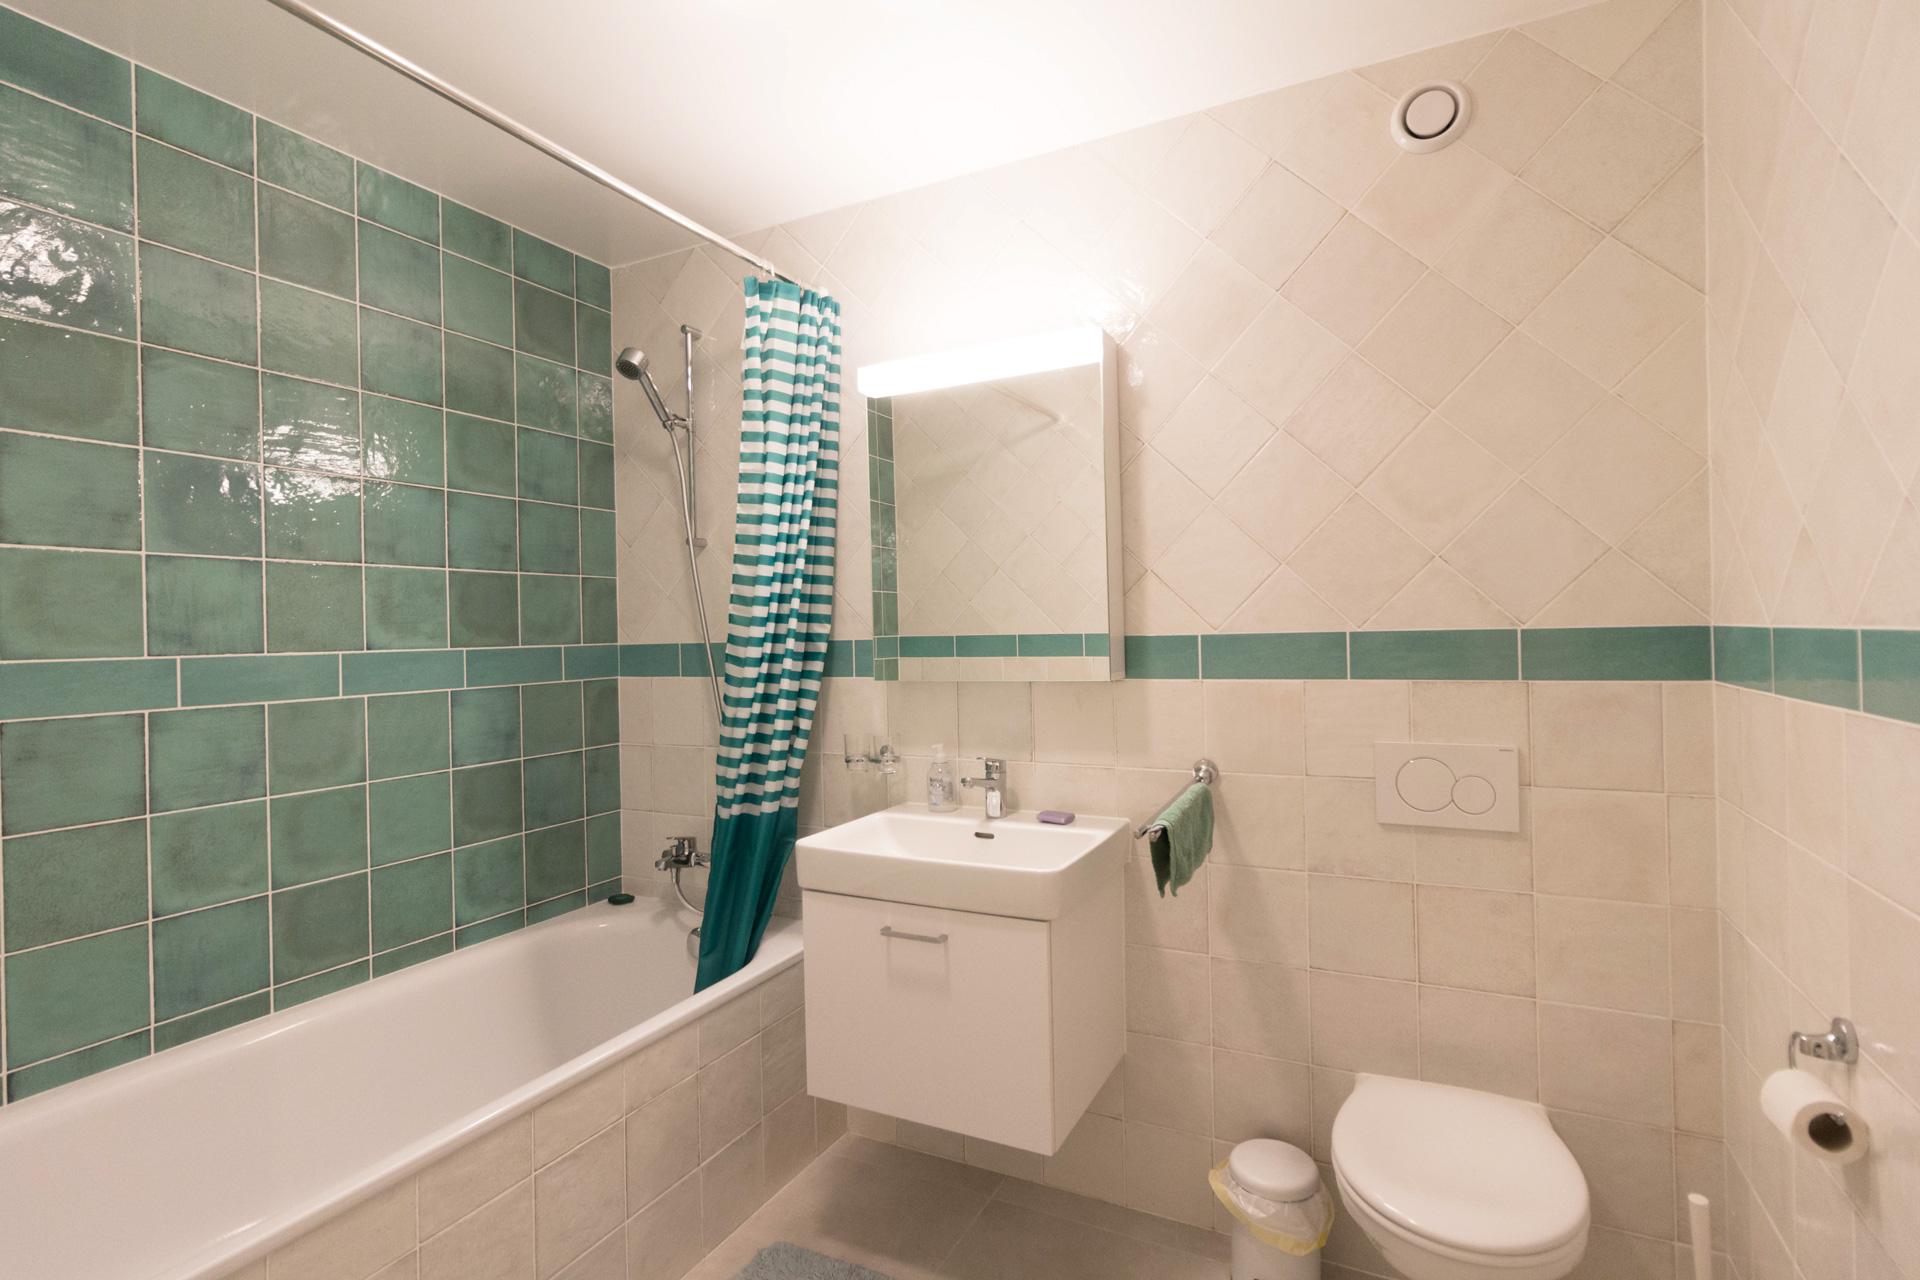 Apartment renovation : Bathroom